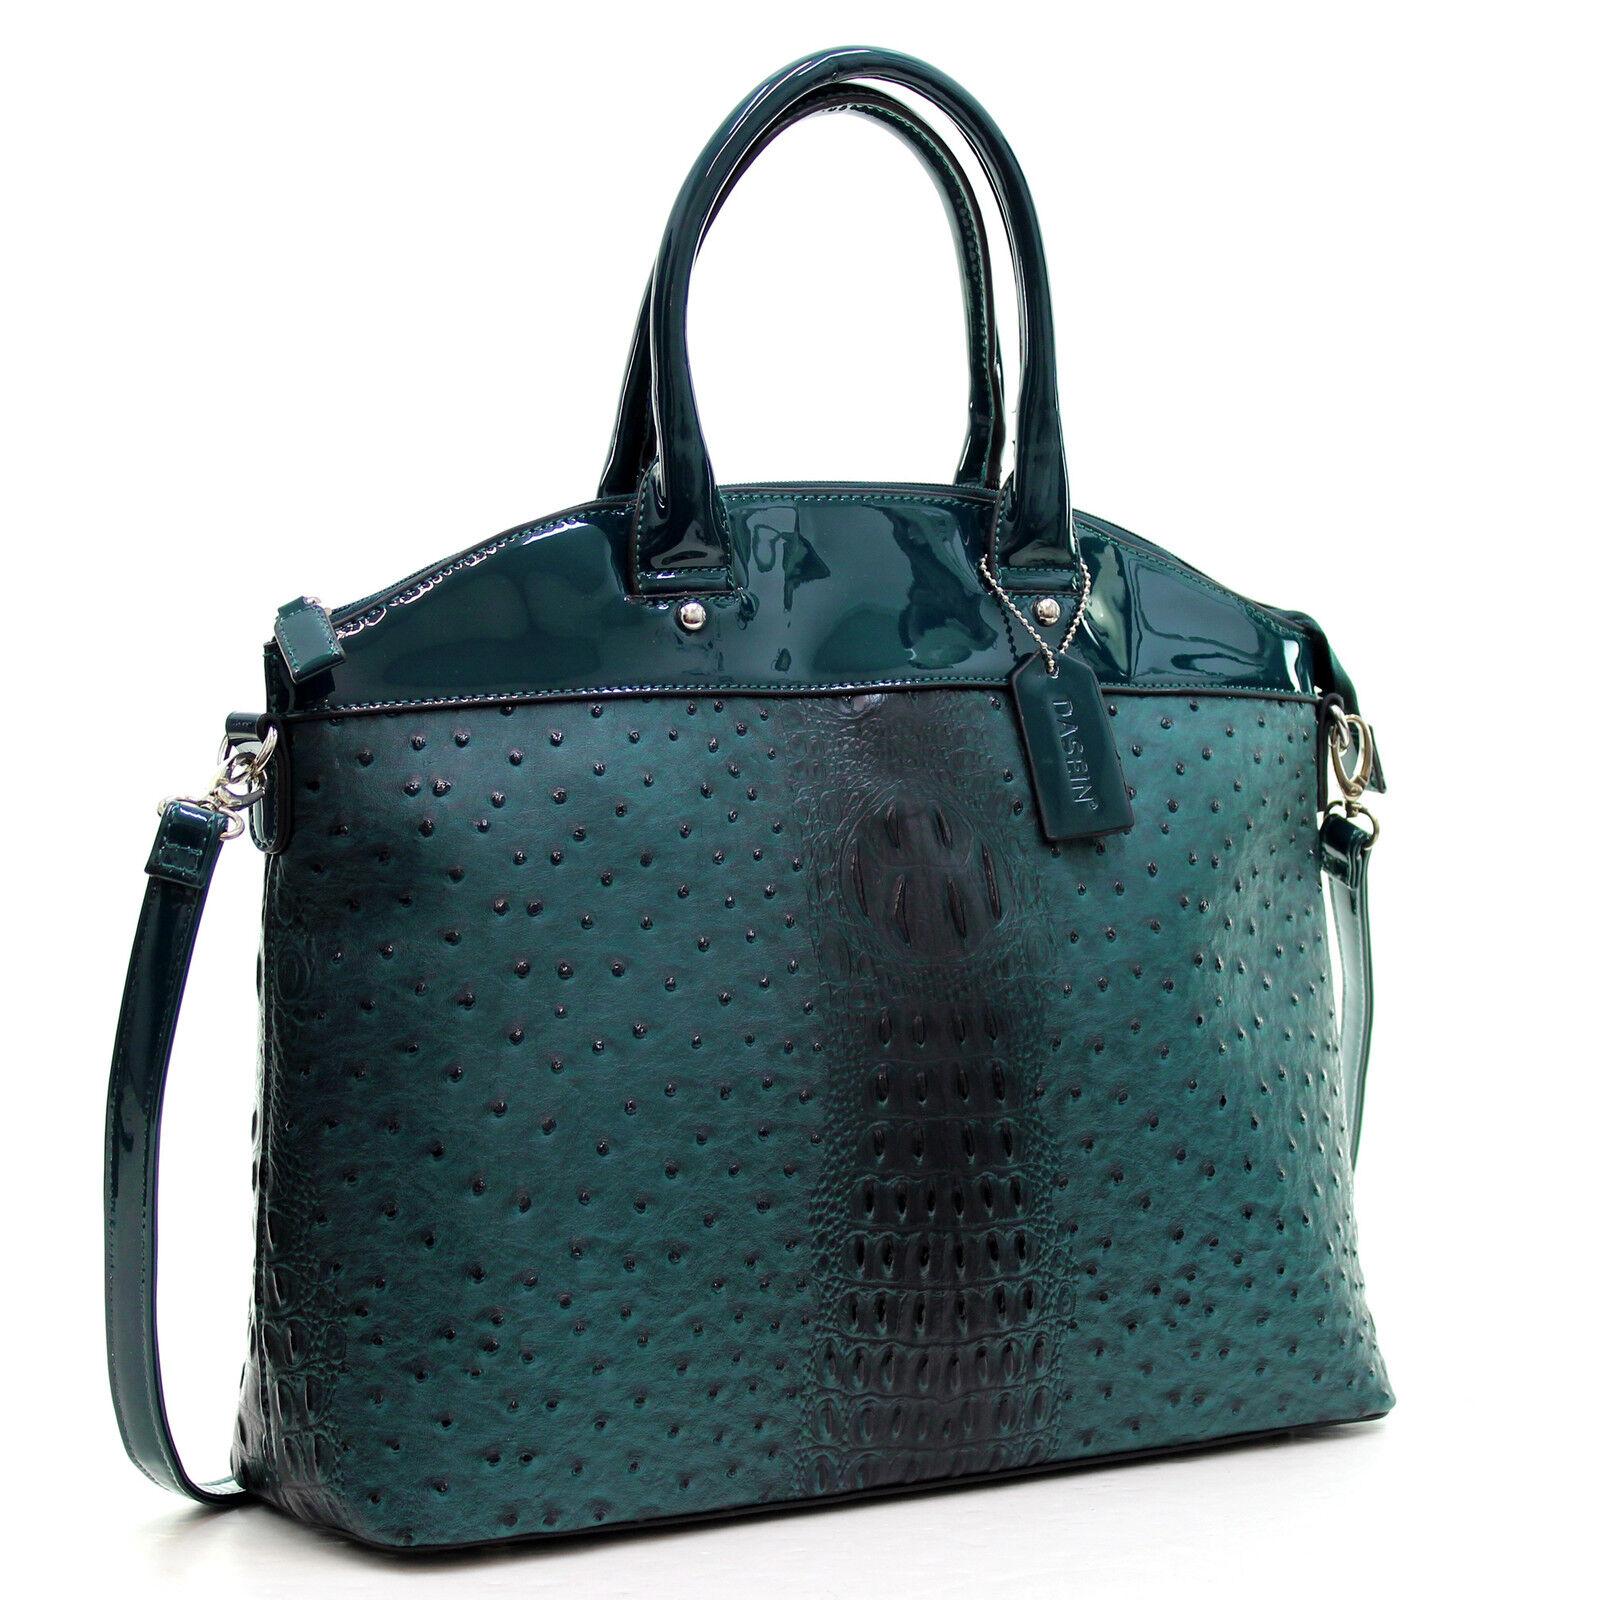 Dasein Womens Handbags Ostrich Faux Leather Tote Shoulder Ba